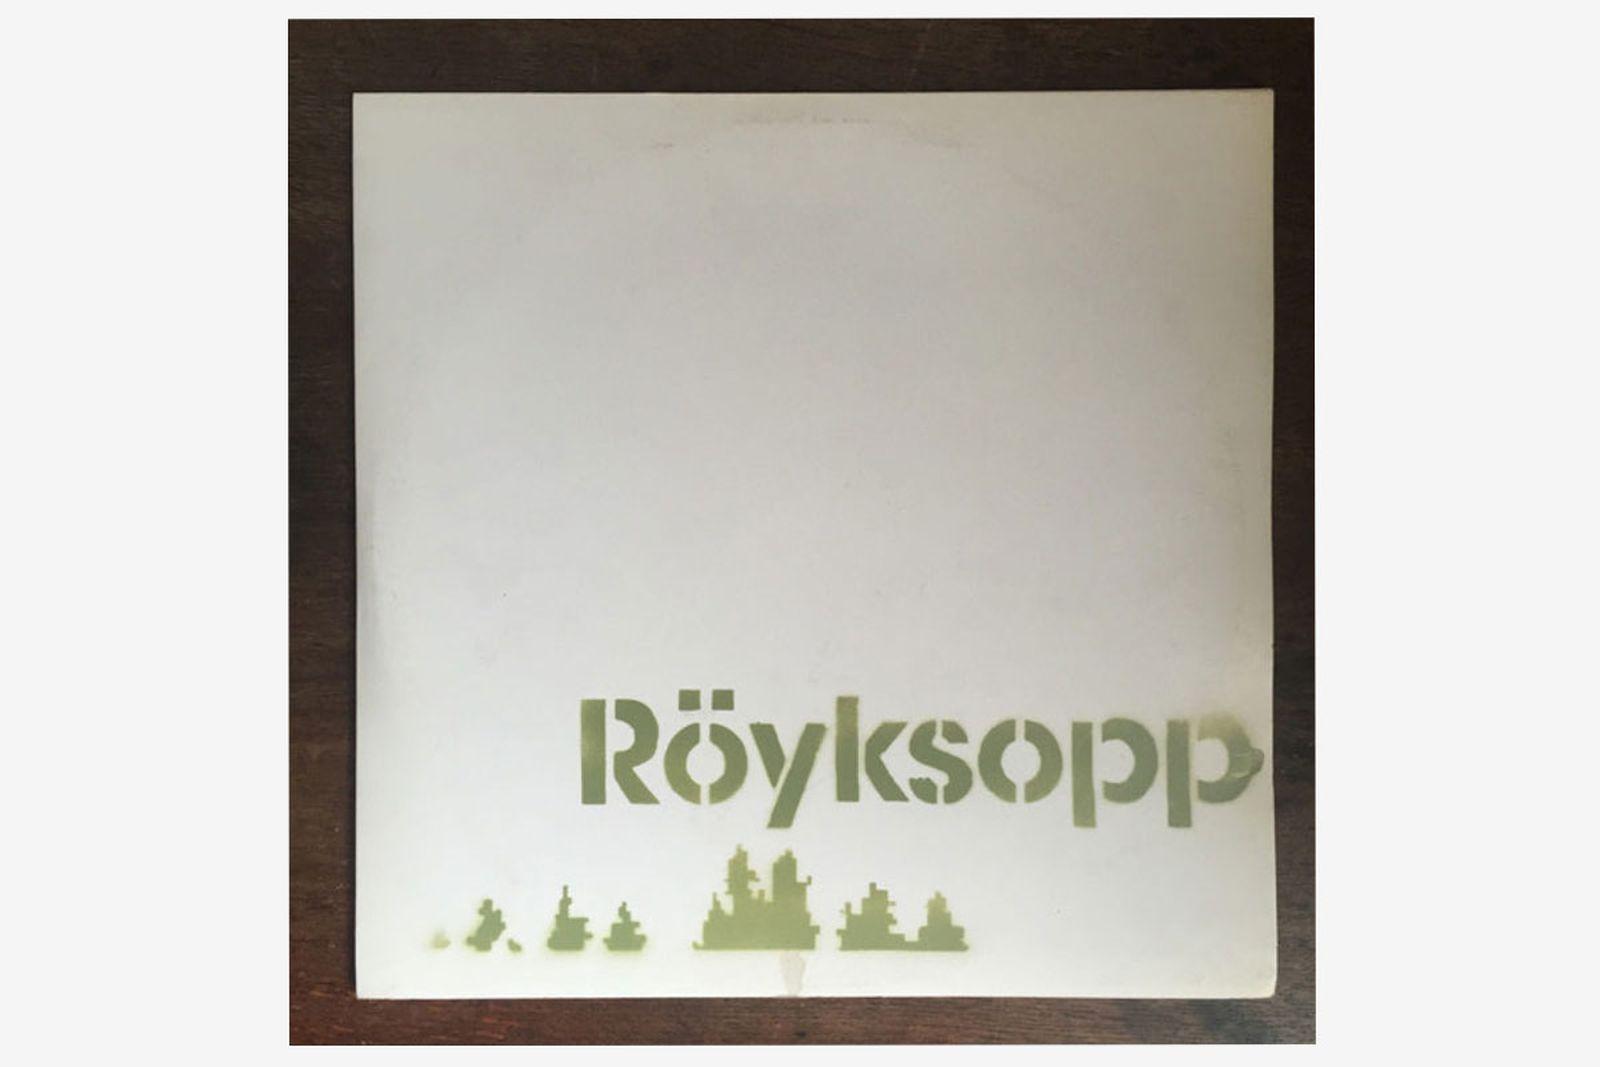 banksy-royksopp-vinyl-cover-discogs-record-01